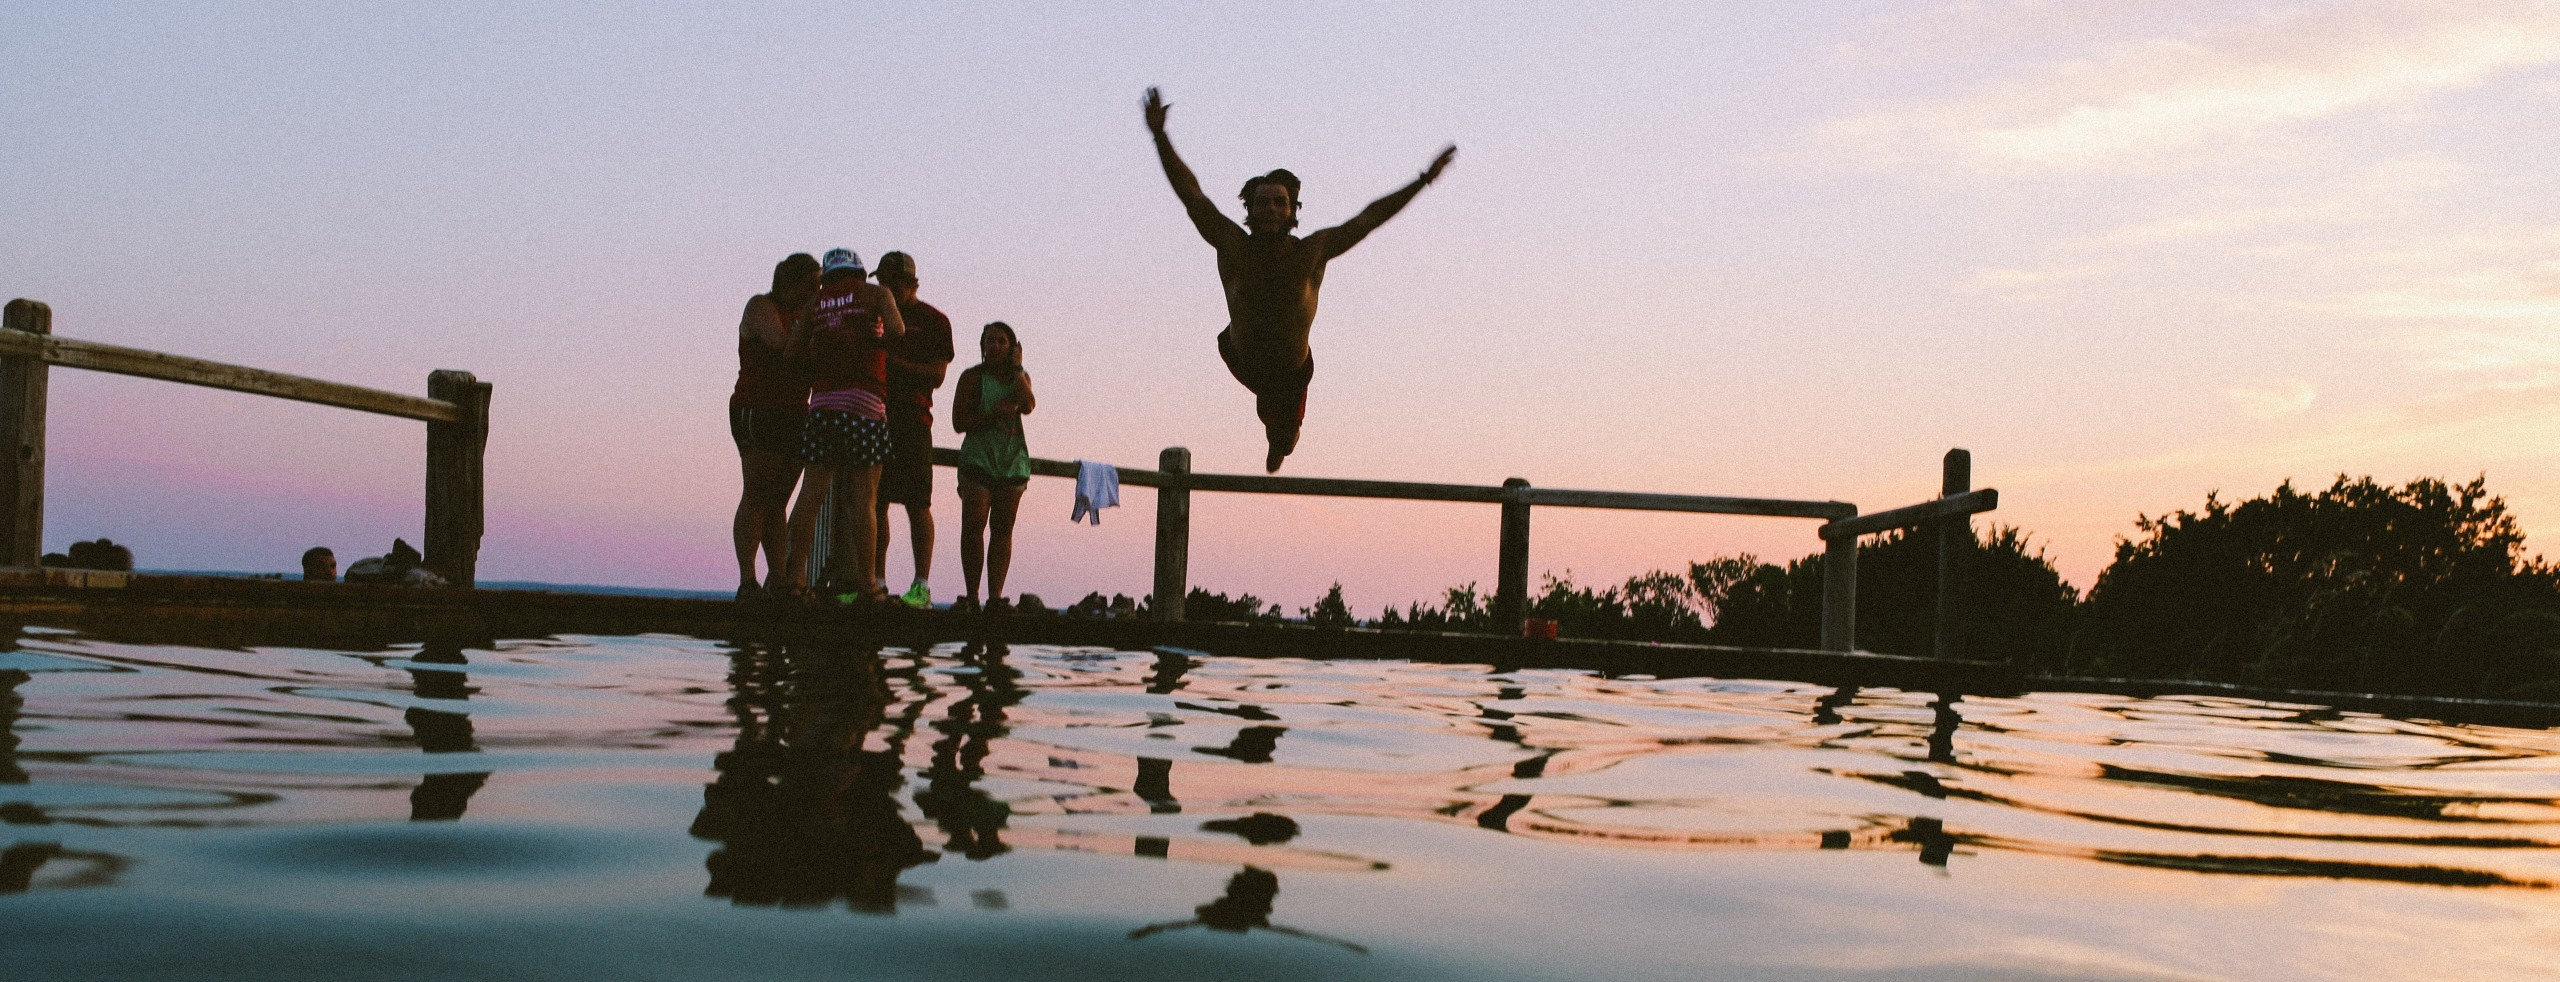 zwemmen bootverhuur